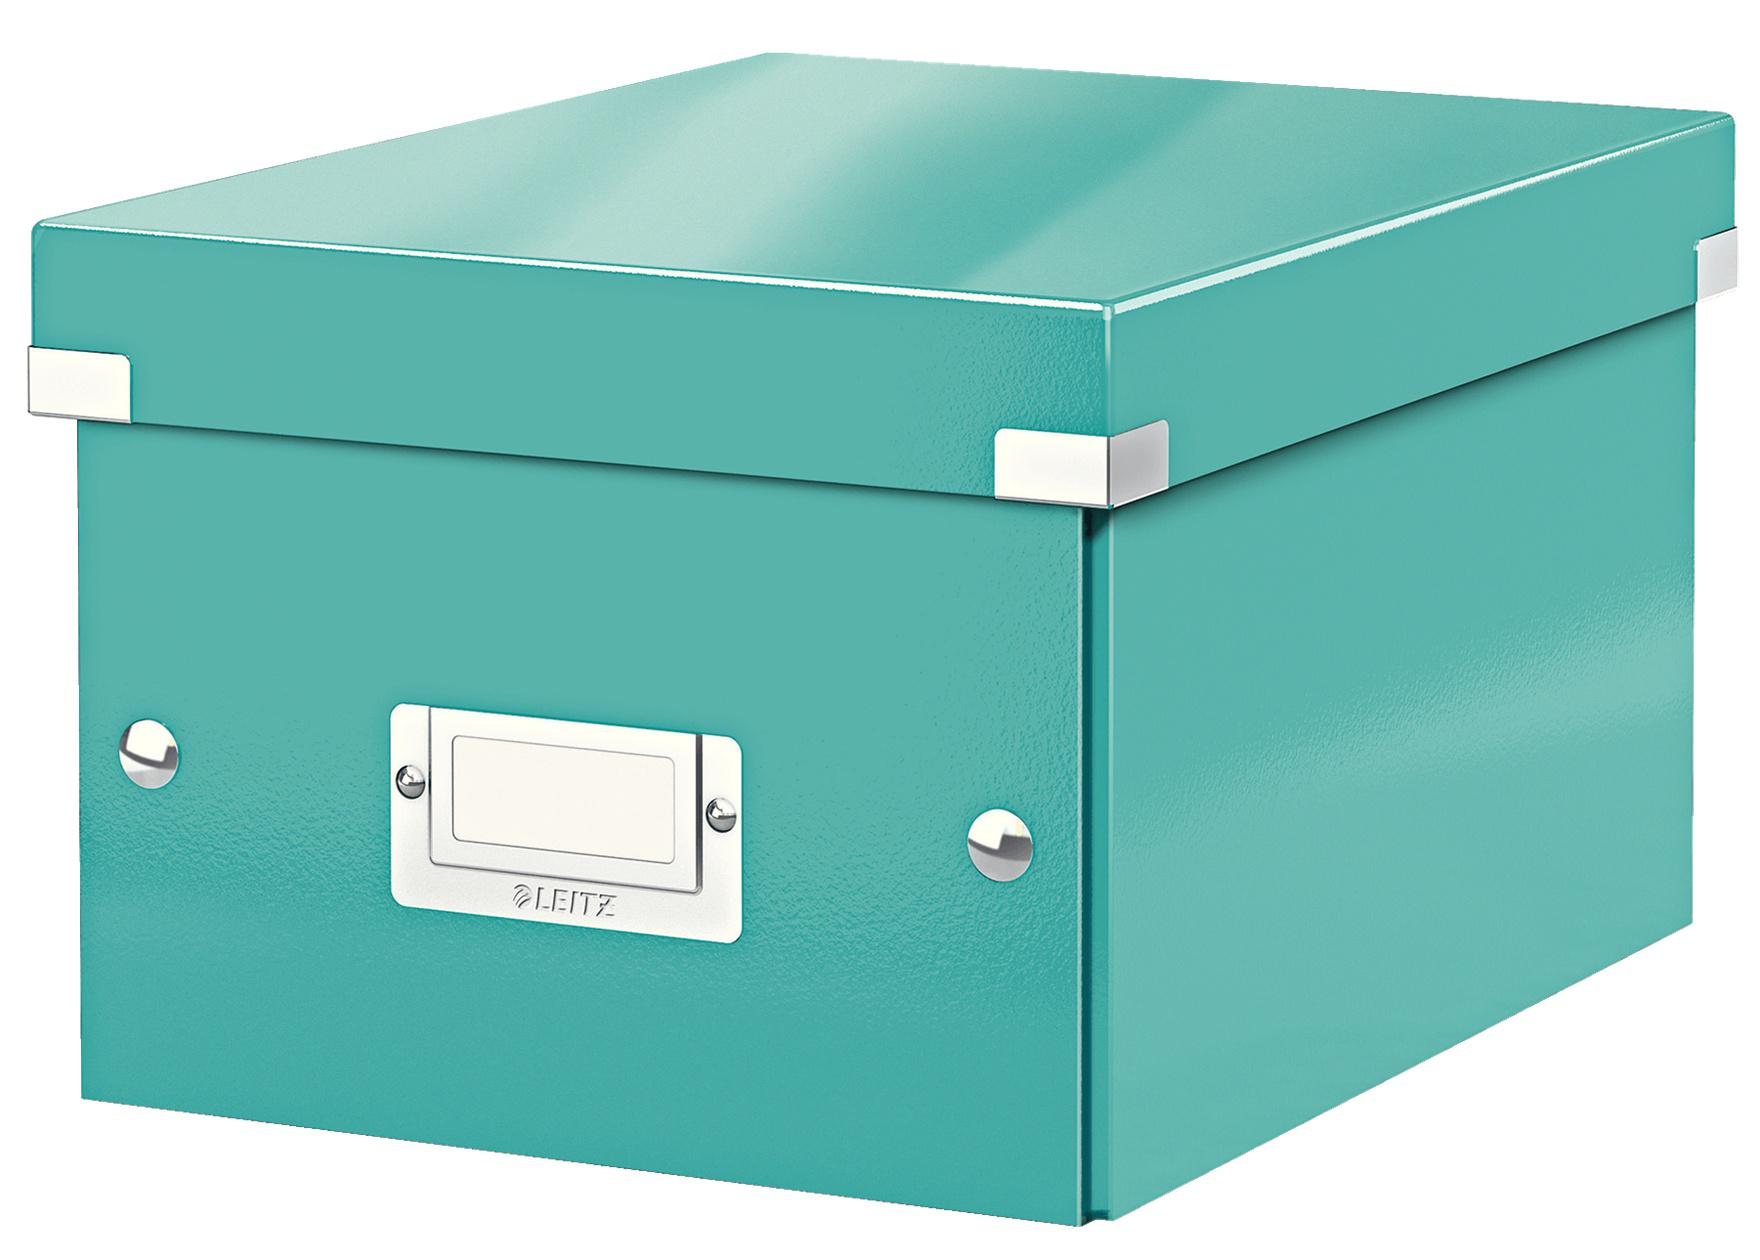 LEITZ Förvaringslåda Leitz Click & Store Liten Isblå